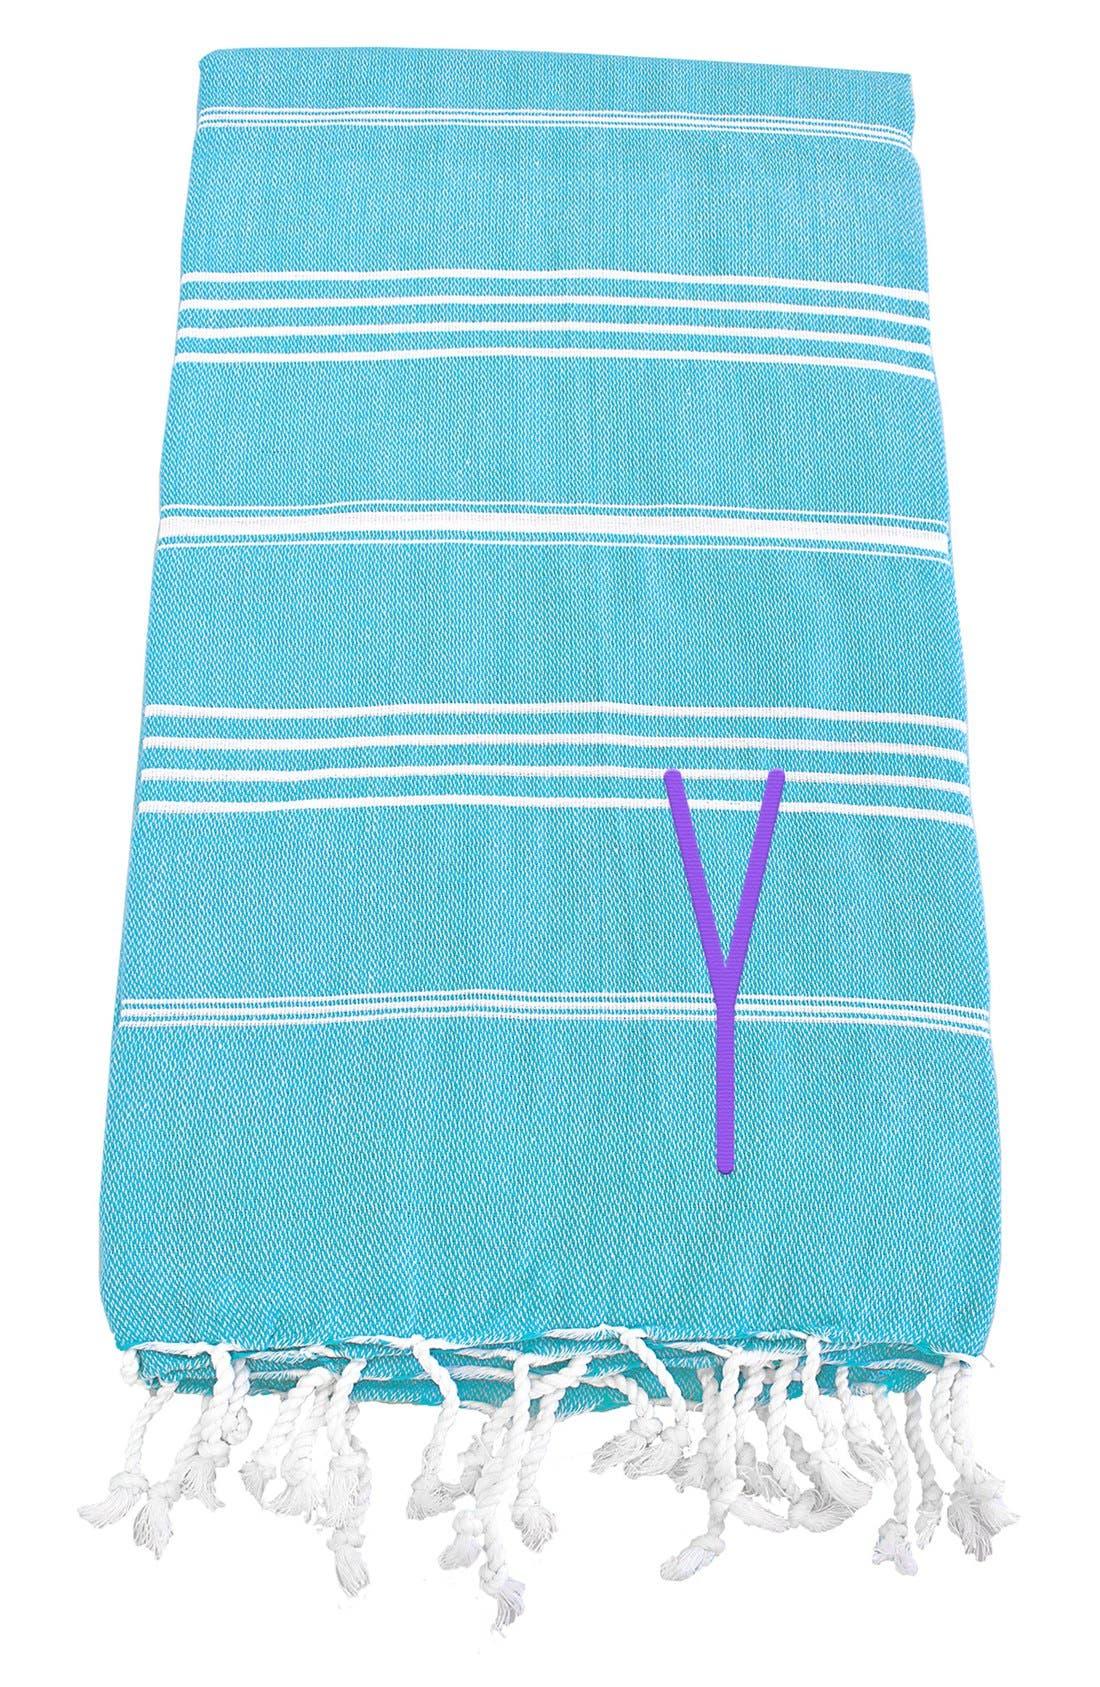 Monogram Turkish Cotton Towel,                             Main thumbnail 1, color,                             Turquoise - Y